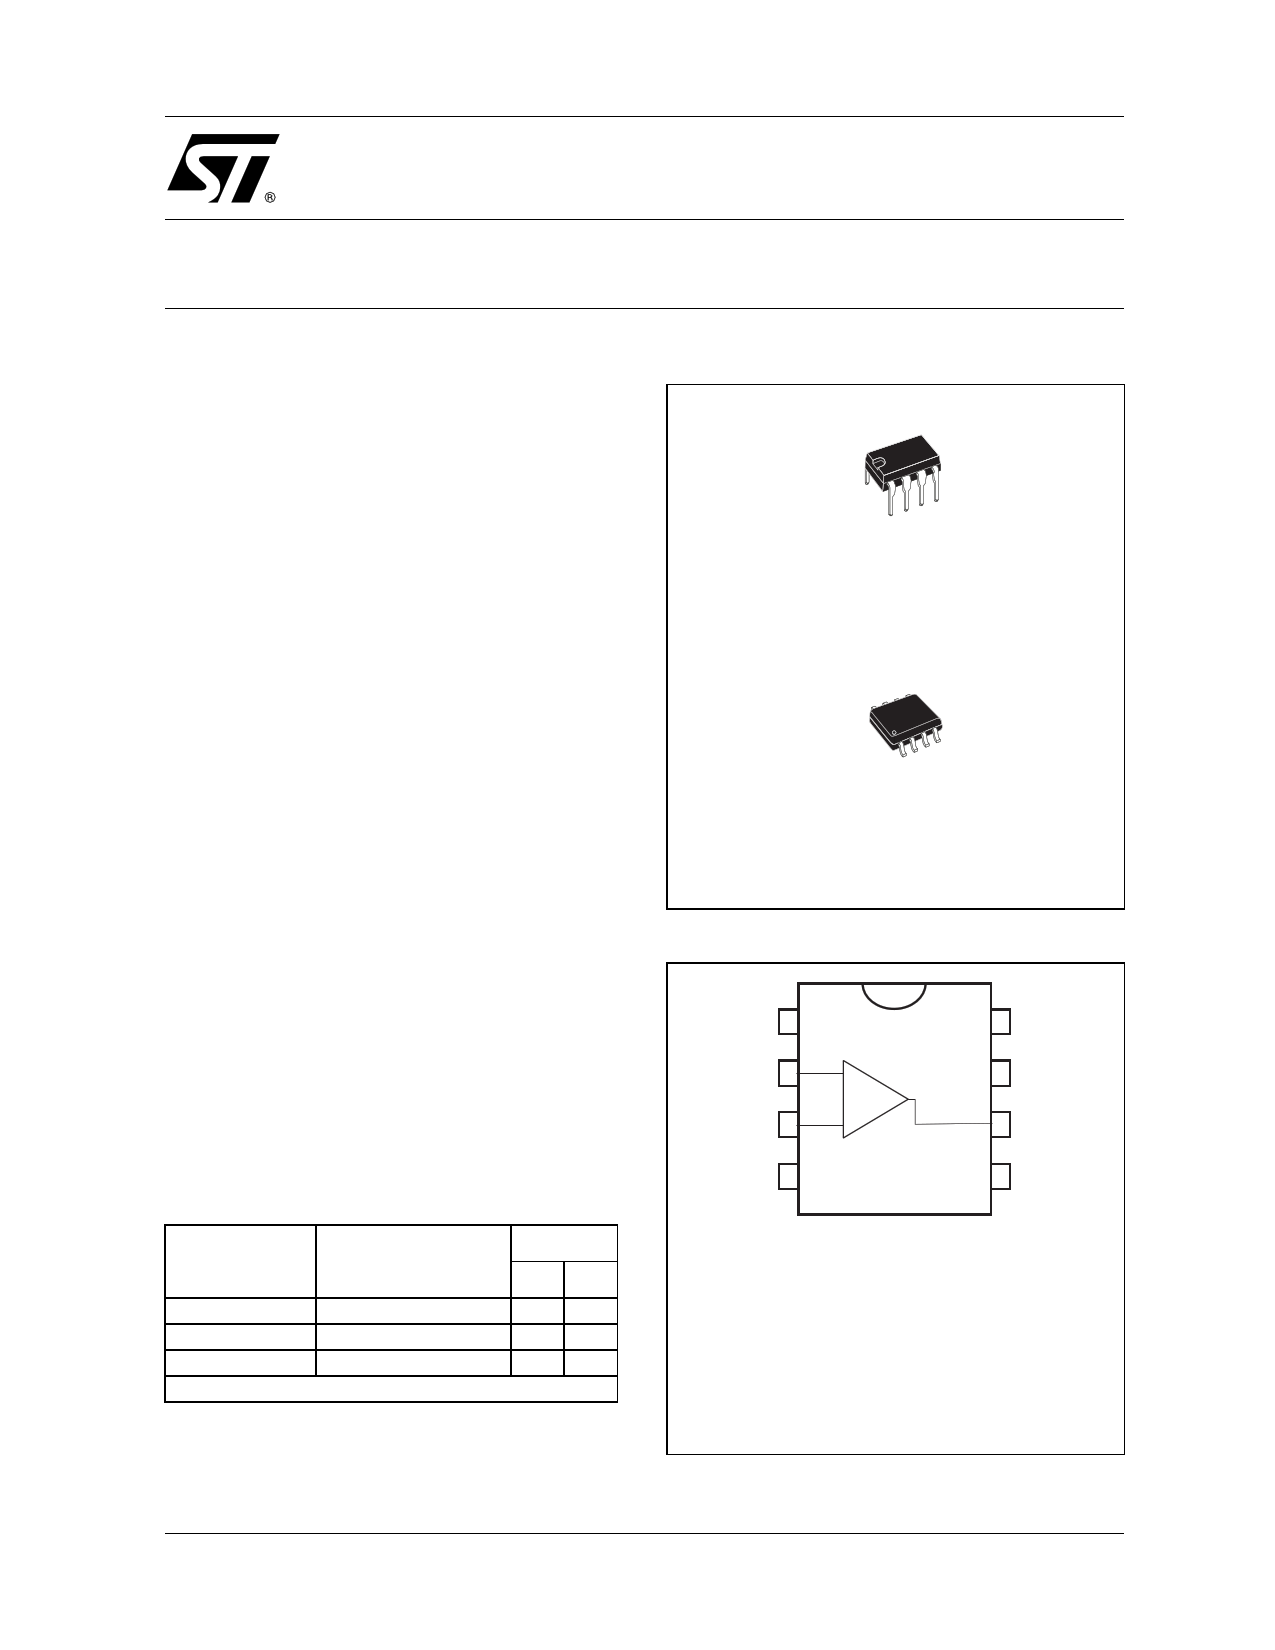 TS271MAM Datasheet, TS271MAM PDF,ピン配置, 機能